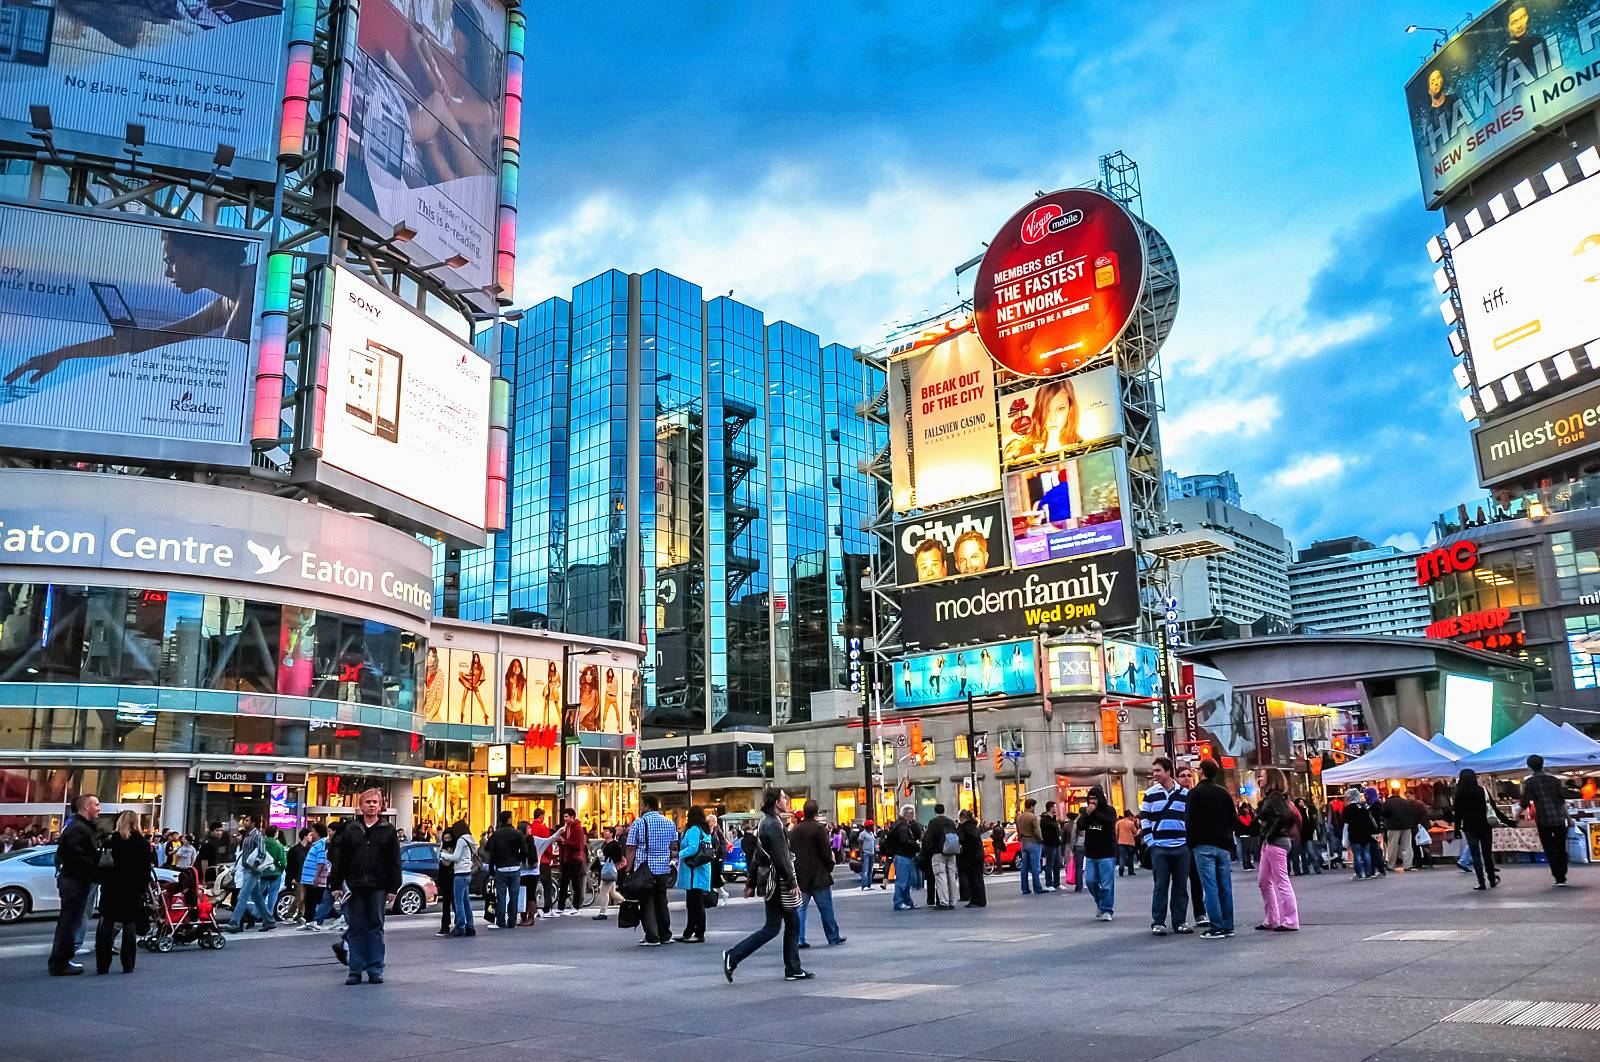 5-Day Canada Tour From Montreal: Montreal, Quebec, Ottawa, Niagara Falls, and Toronto